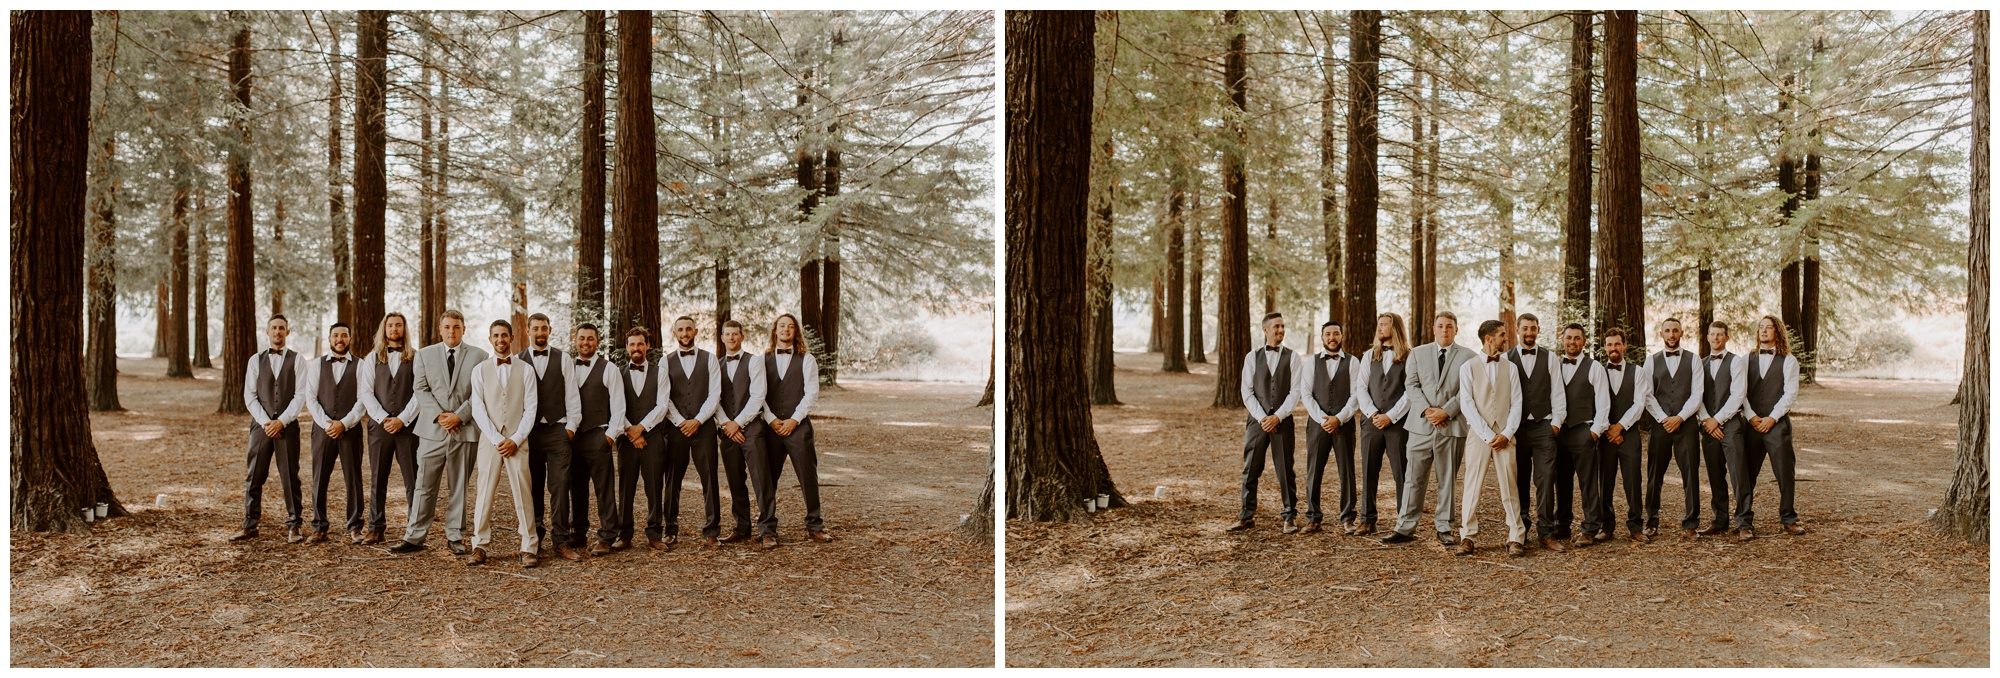 Redwood Festival Wedding Humbolt California - Jessica Heron Images_0023.jpg